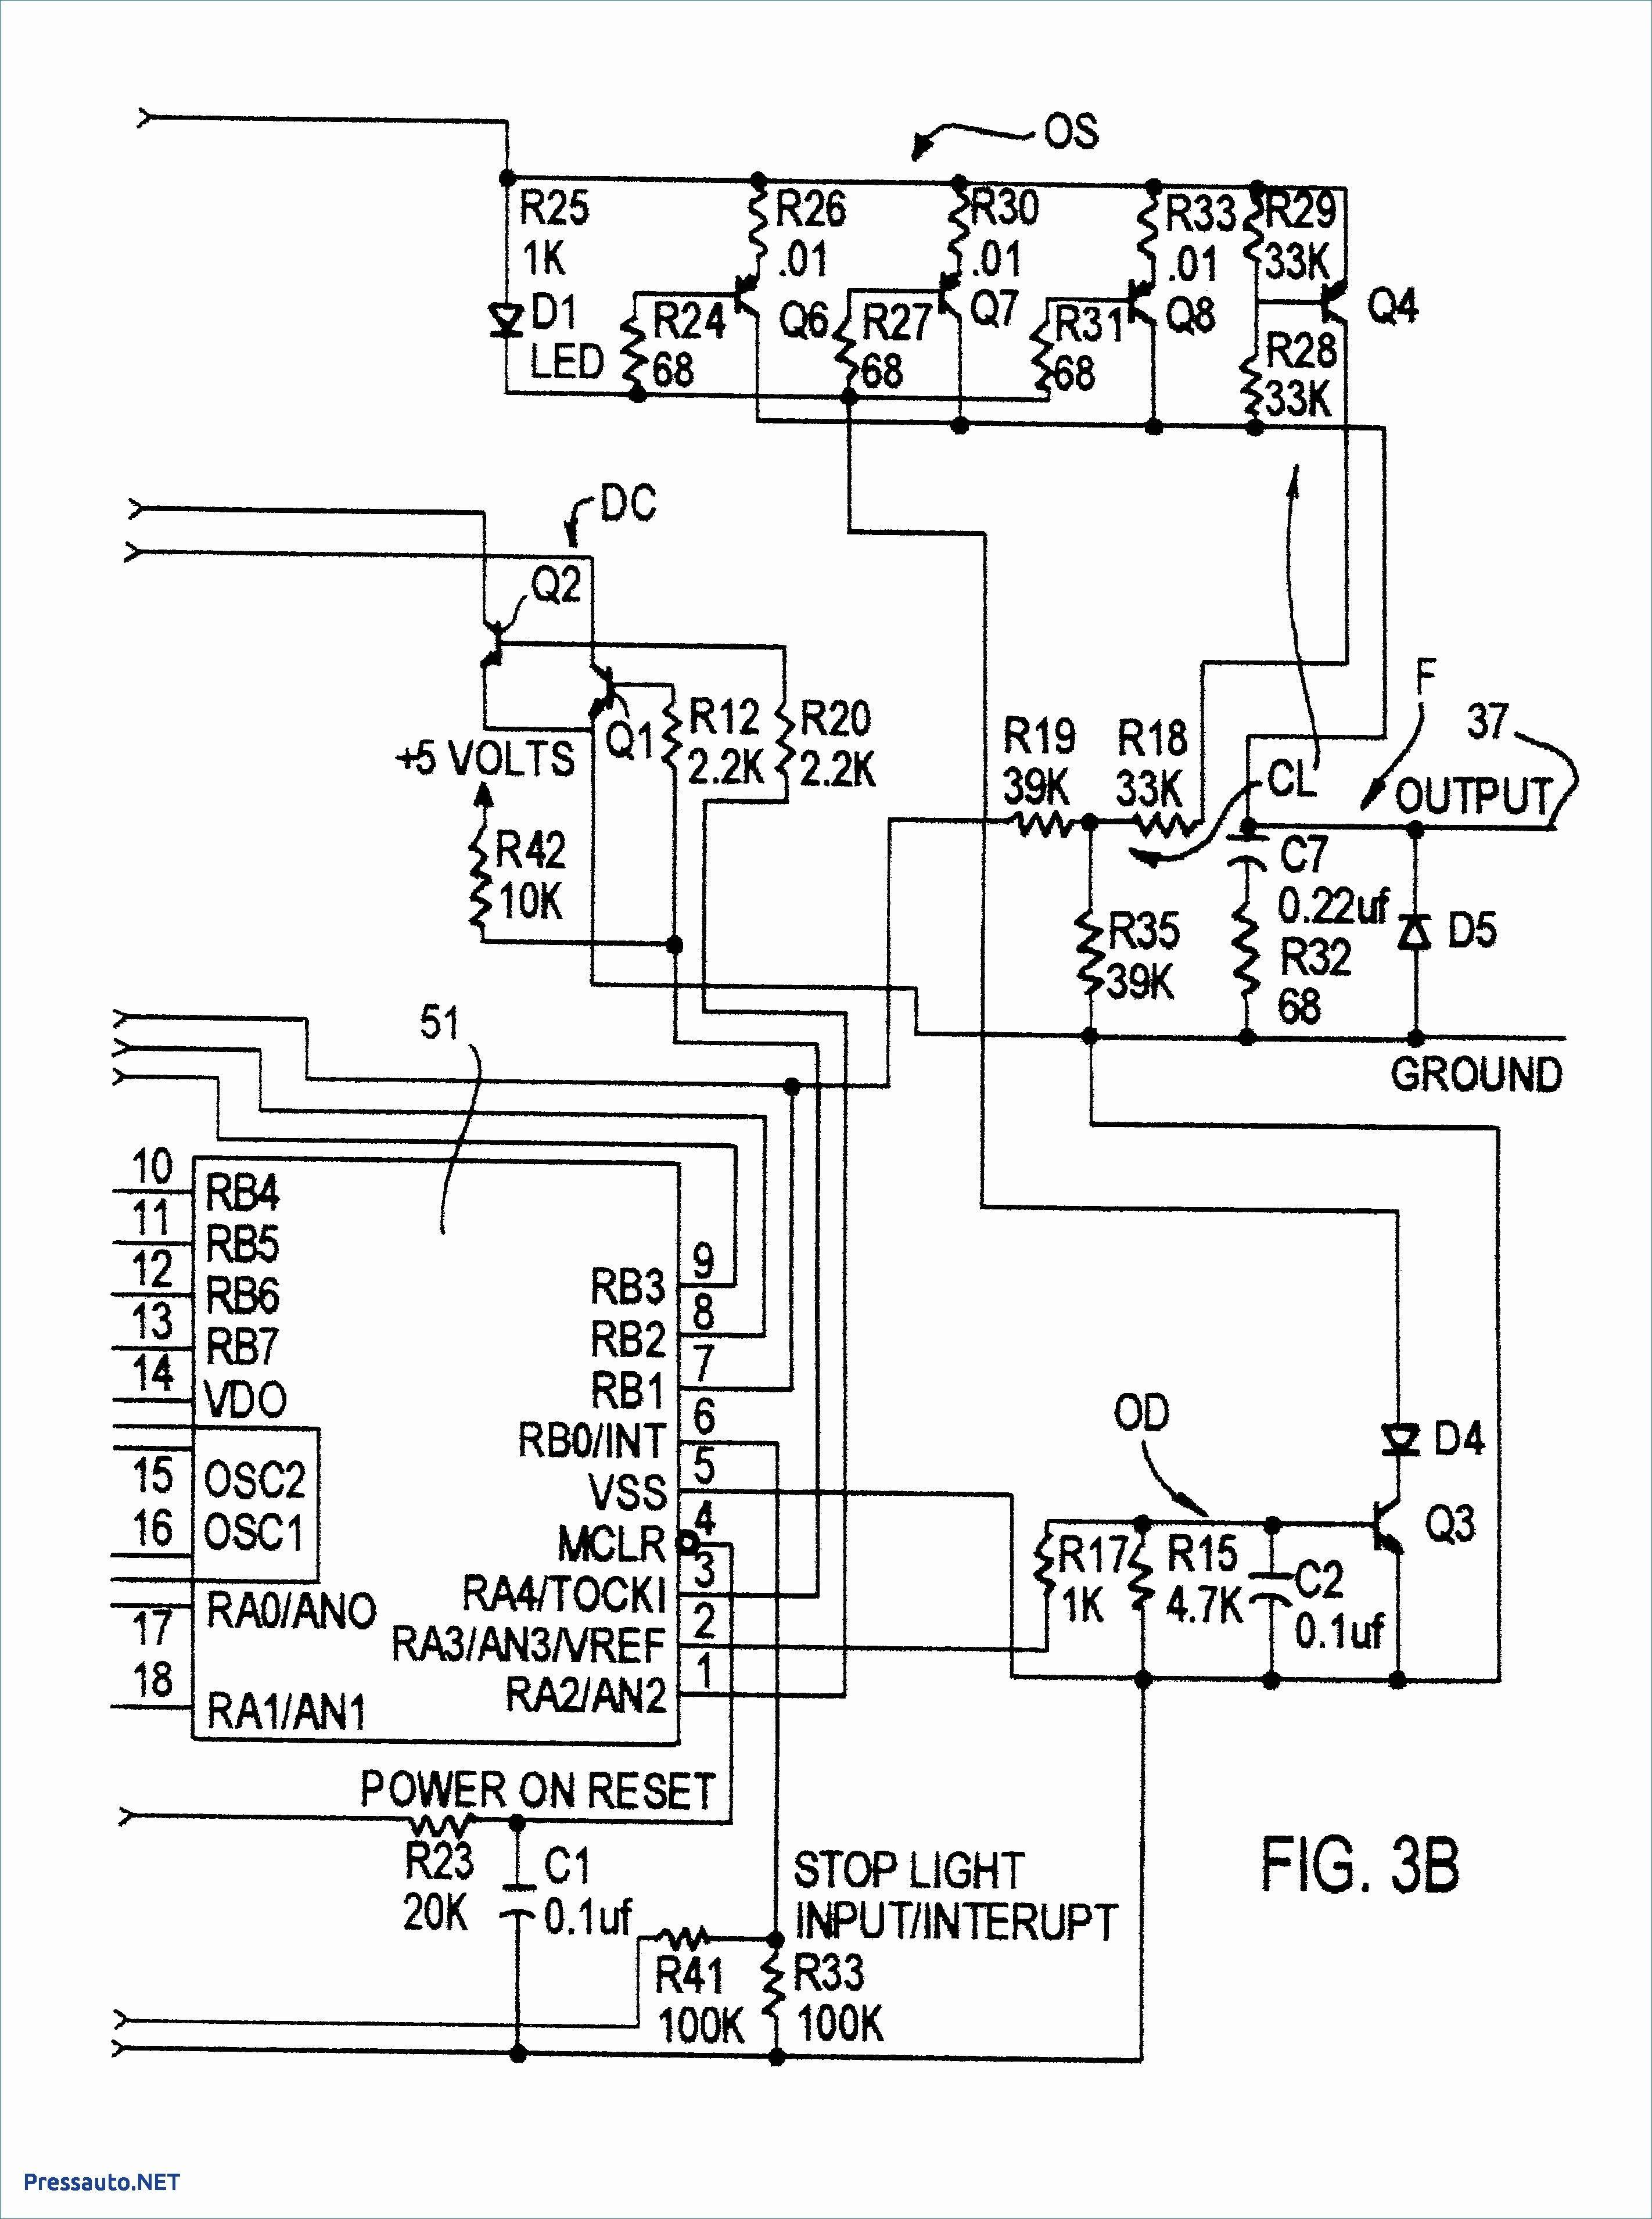 Rv Satellite Wiring Diagram In